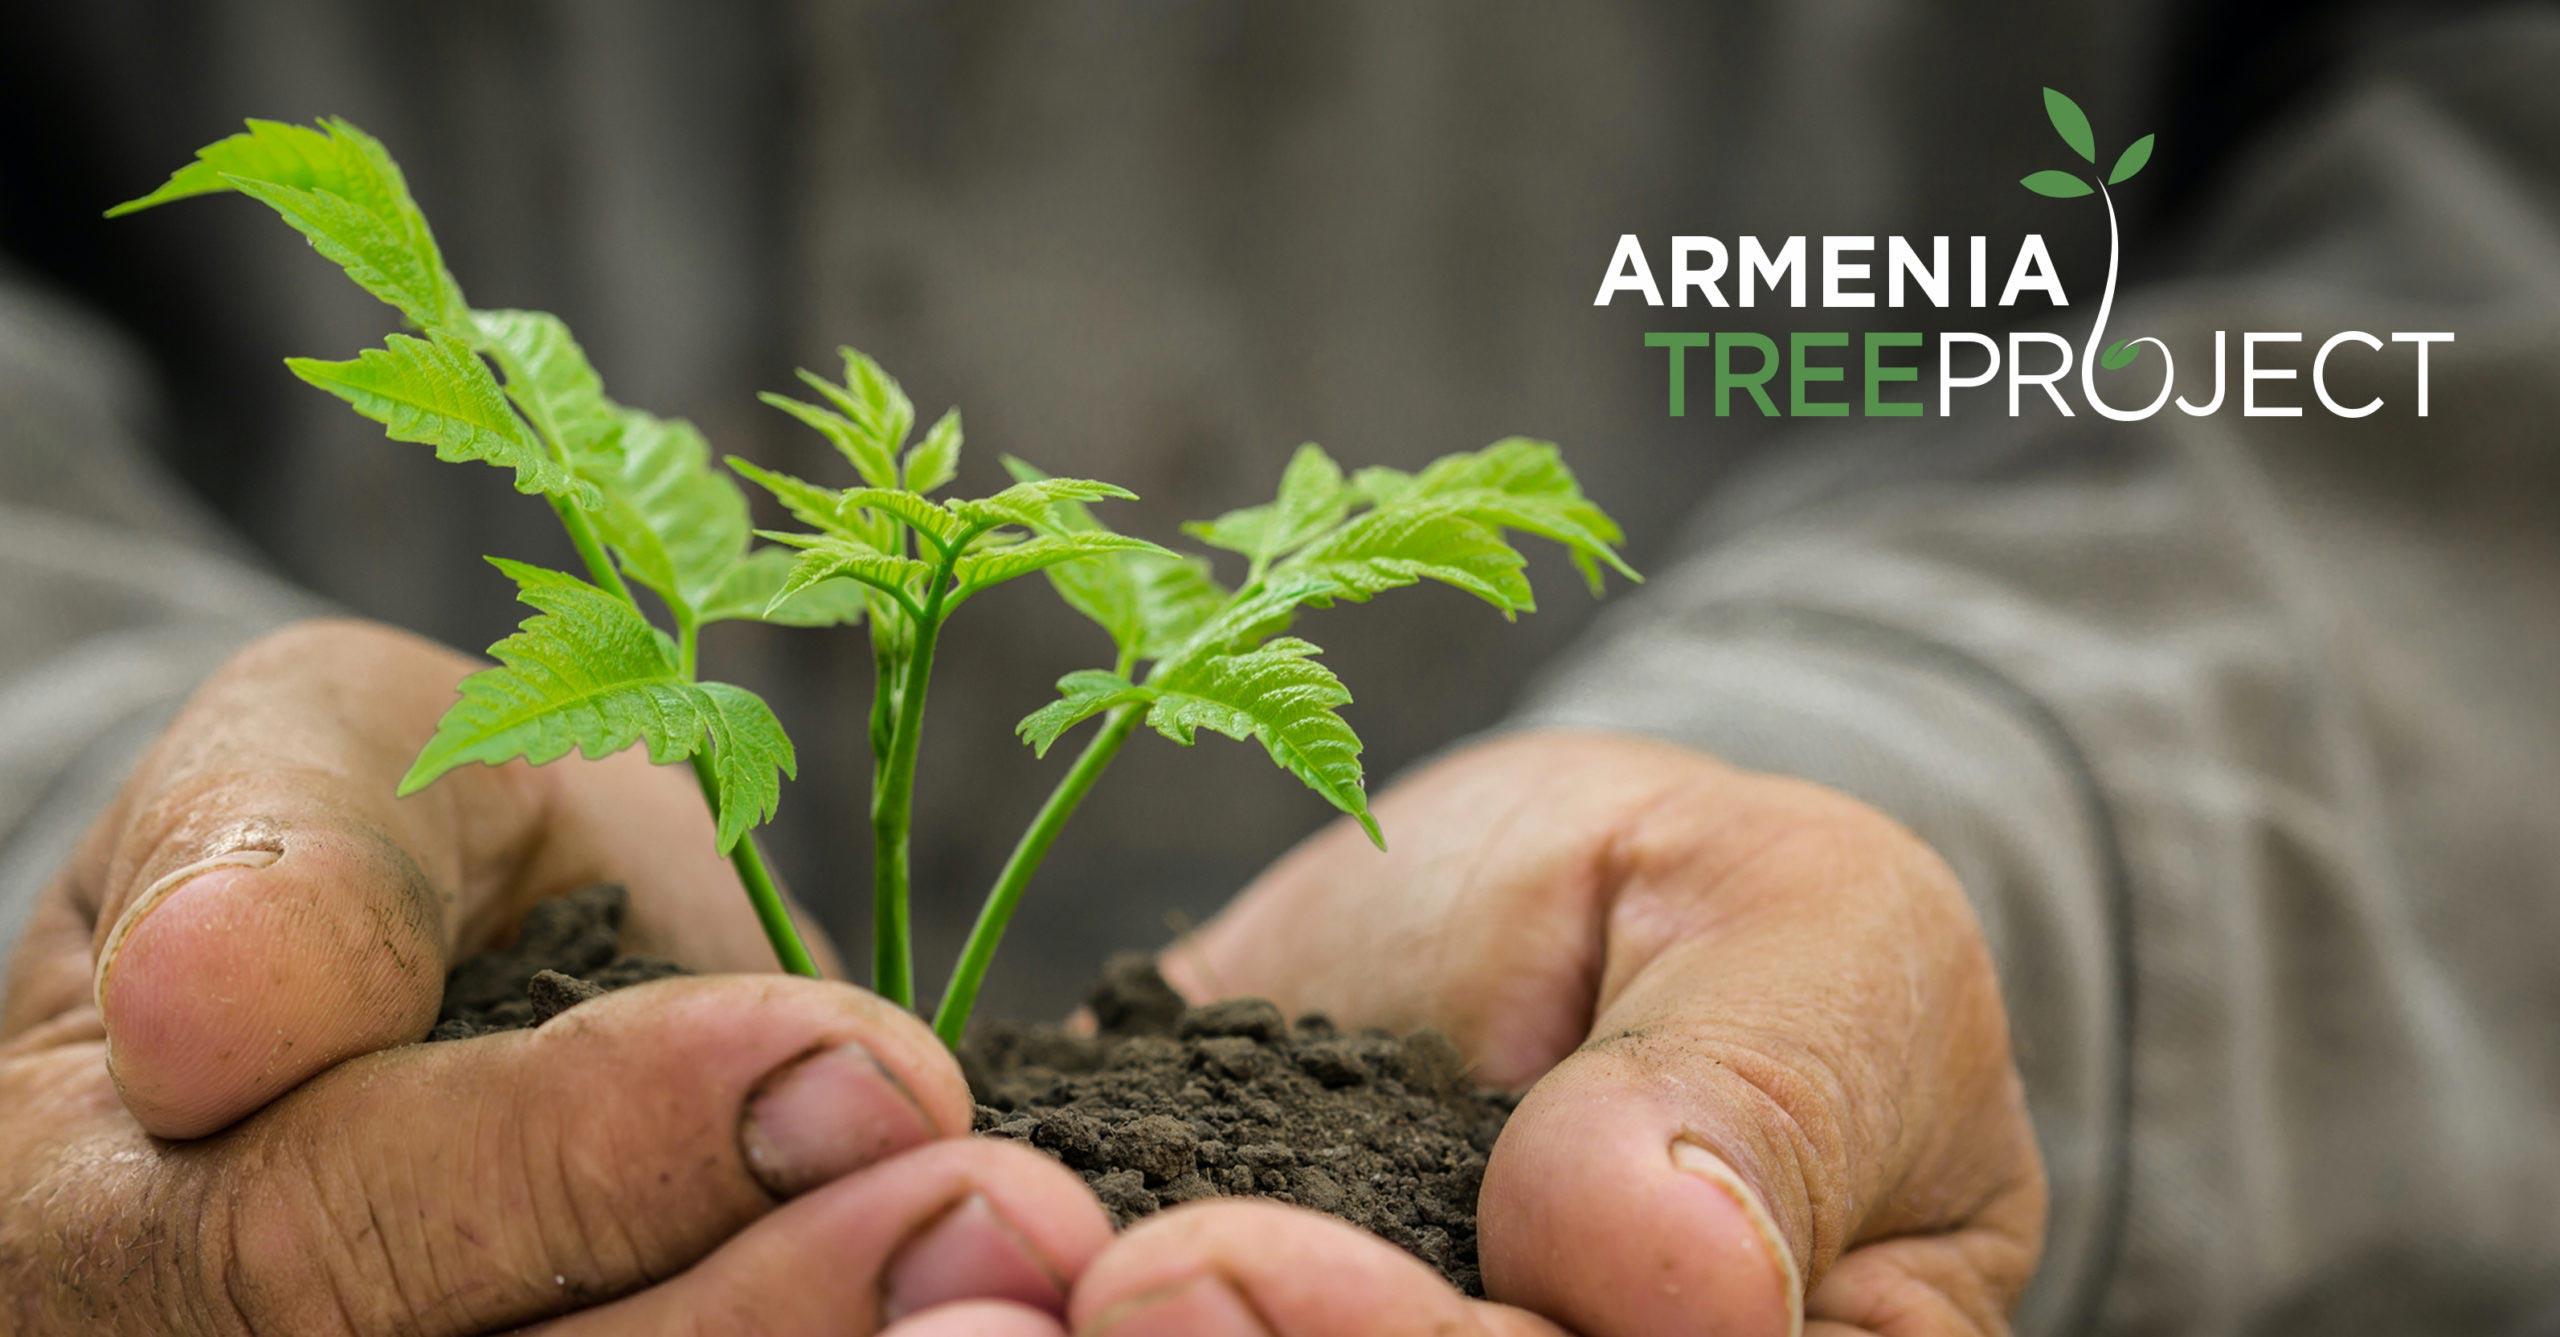 Armenian Tree Project